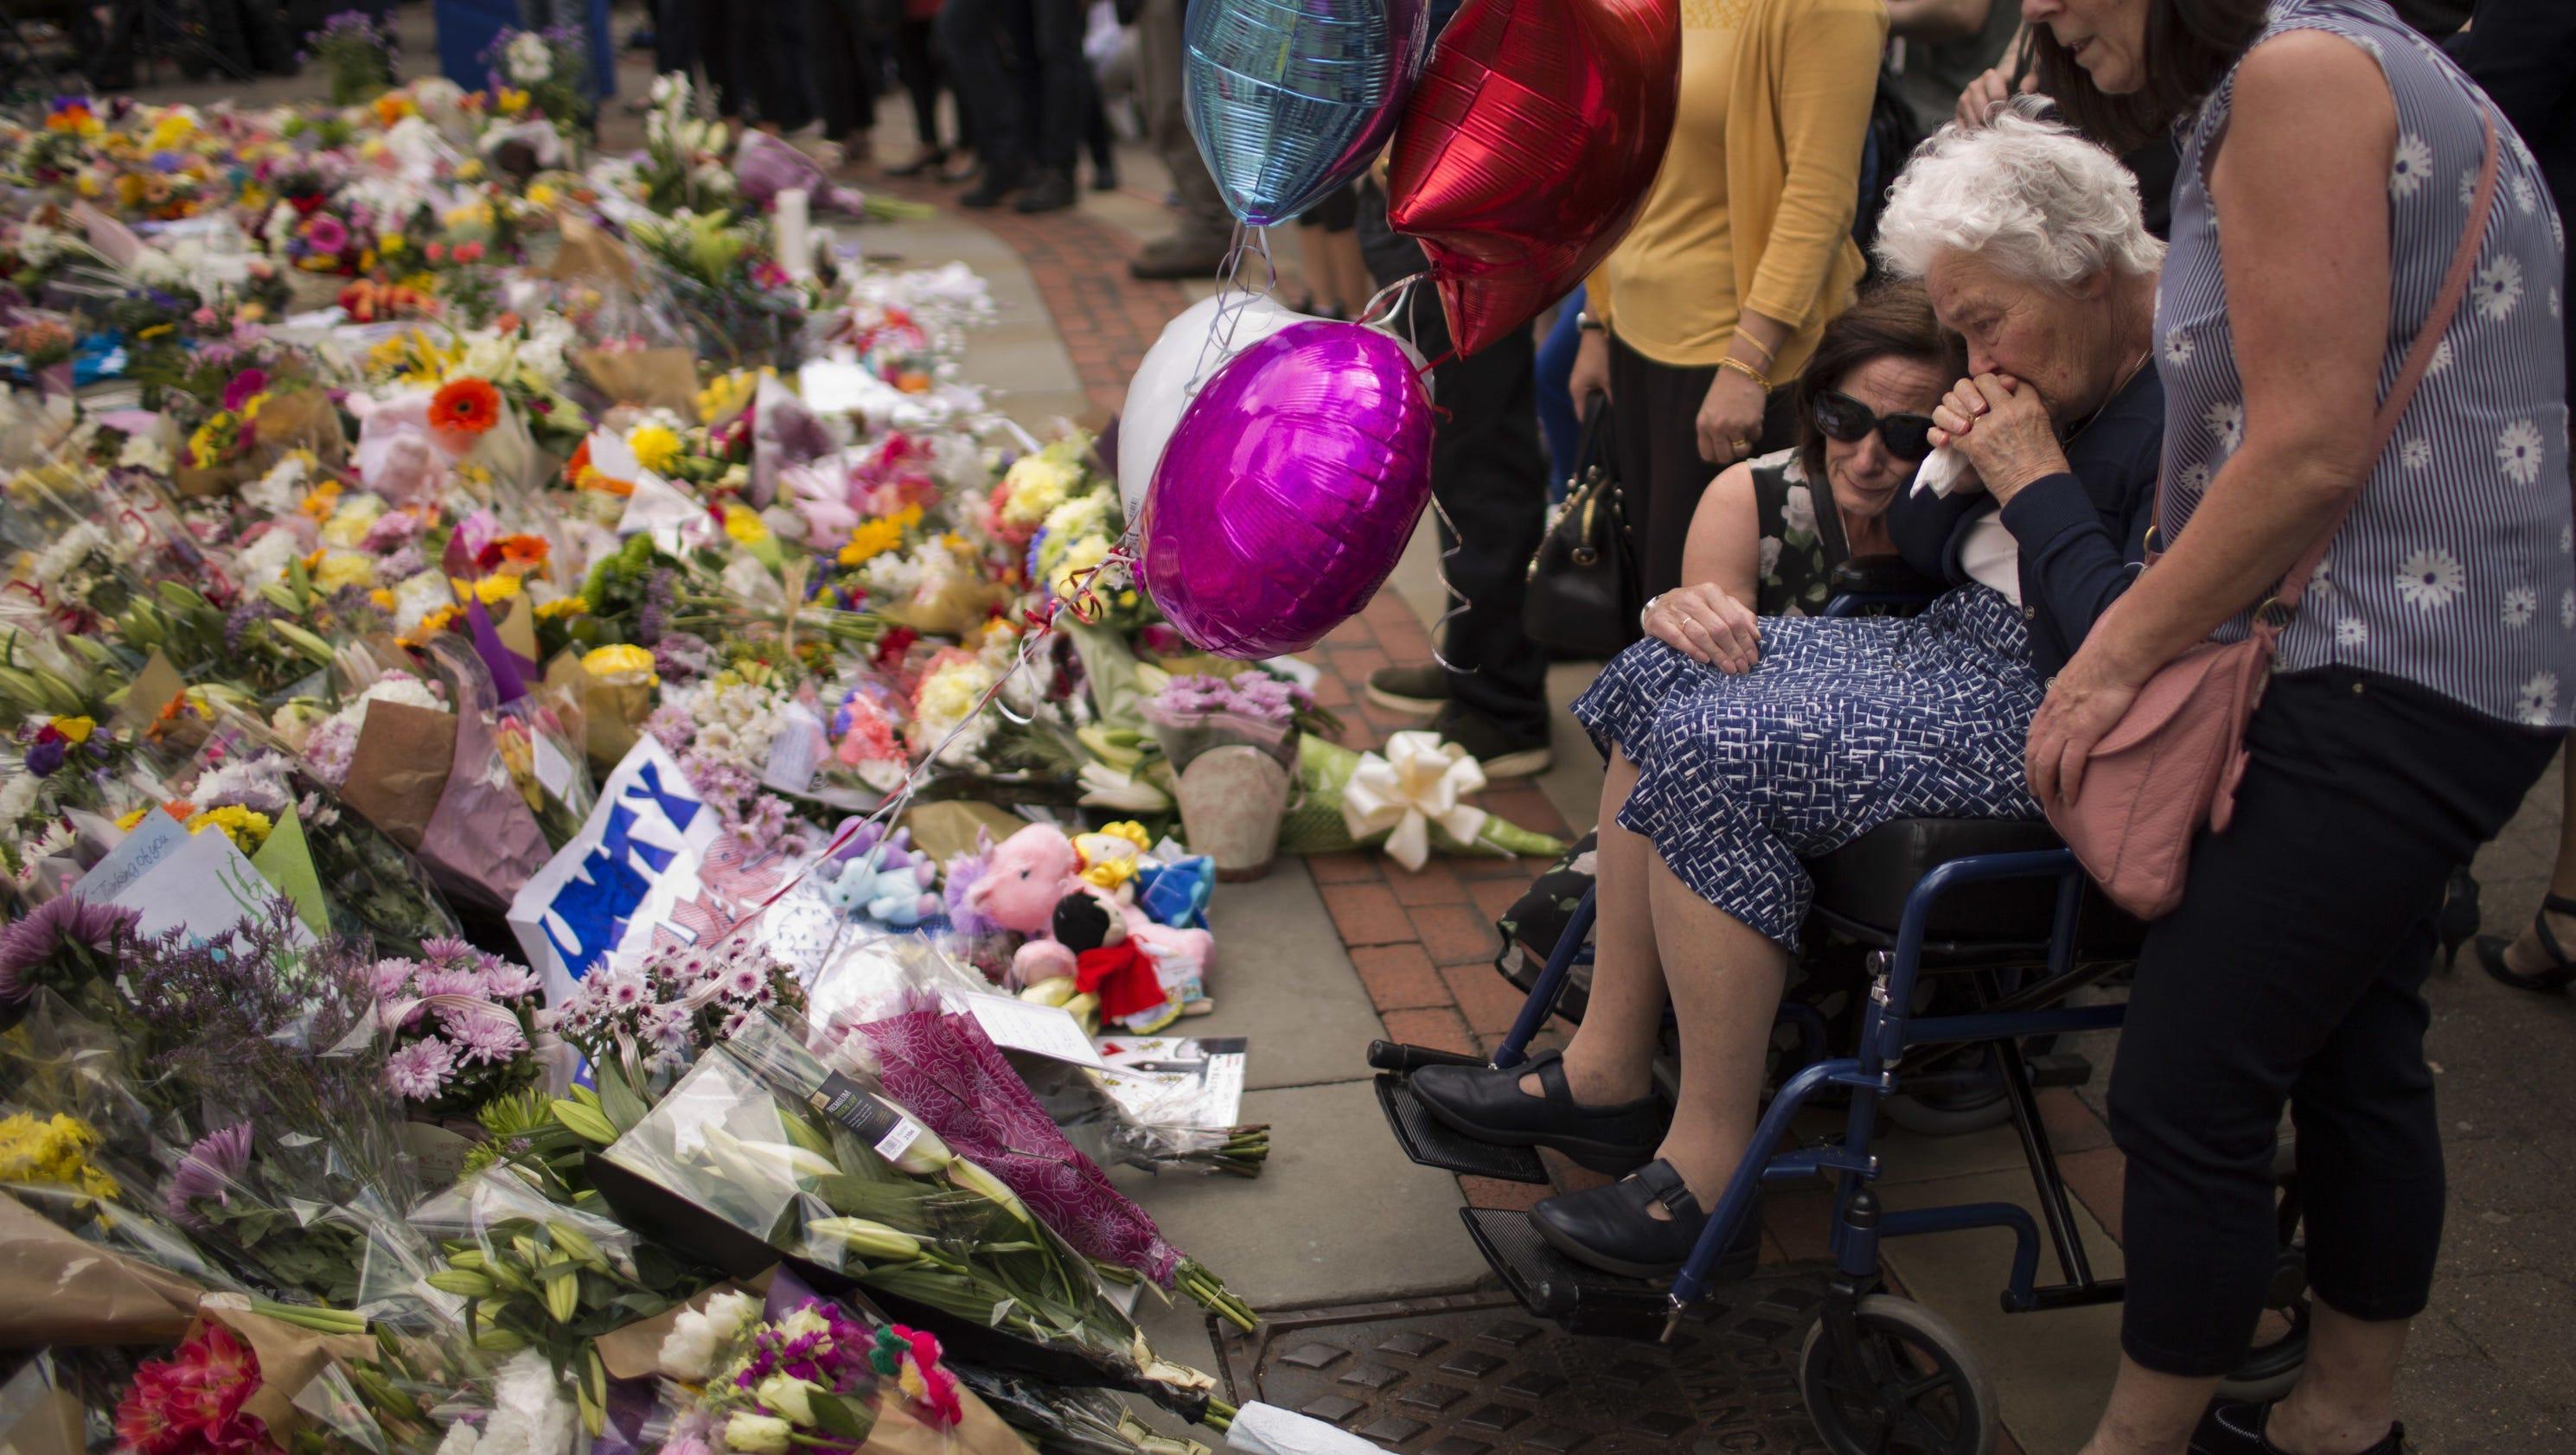 Manchester bombing: Ariana Grande's stage manager recalls explosion, pandemonium